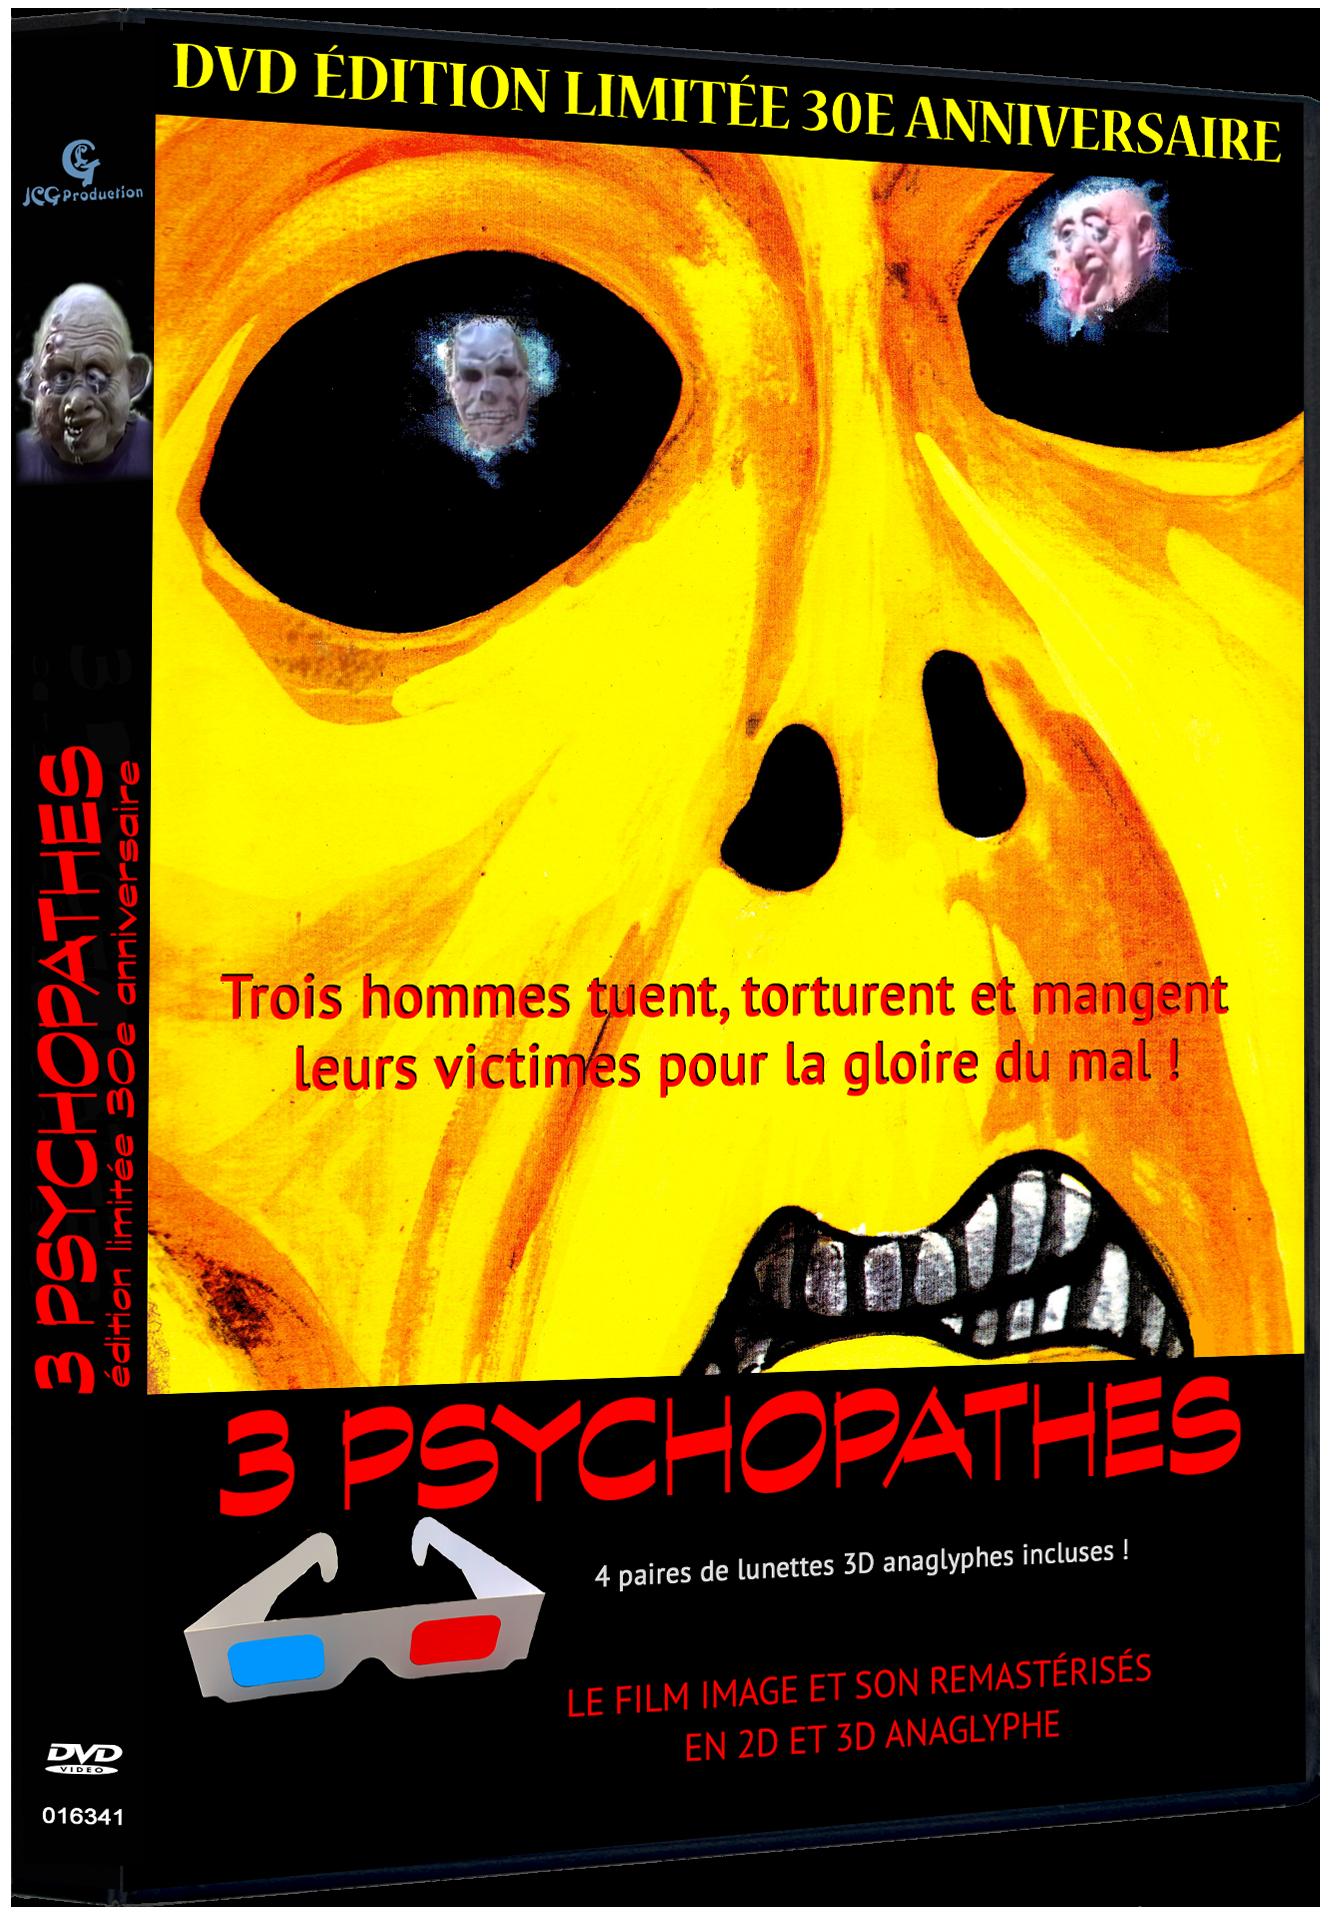 3 Psychopathes trentenaires